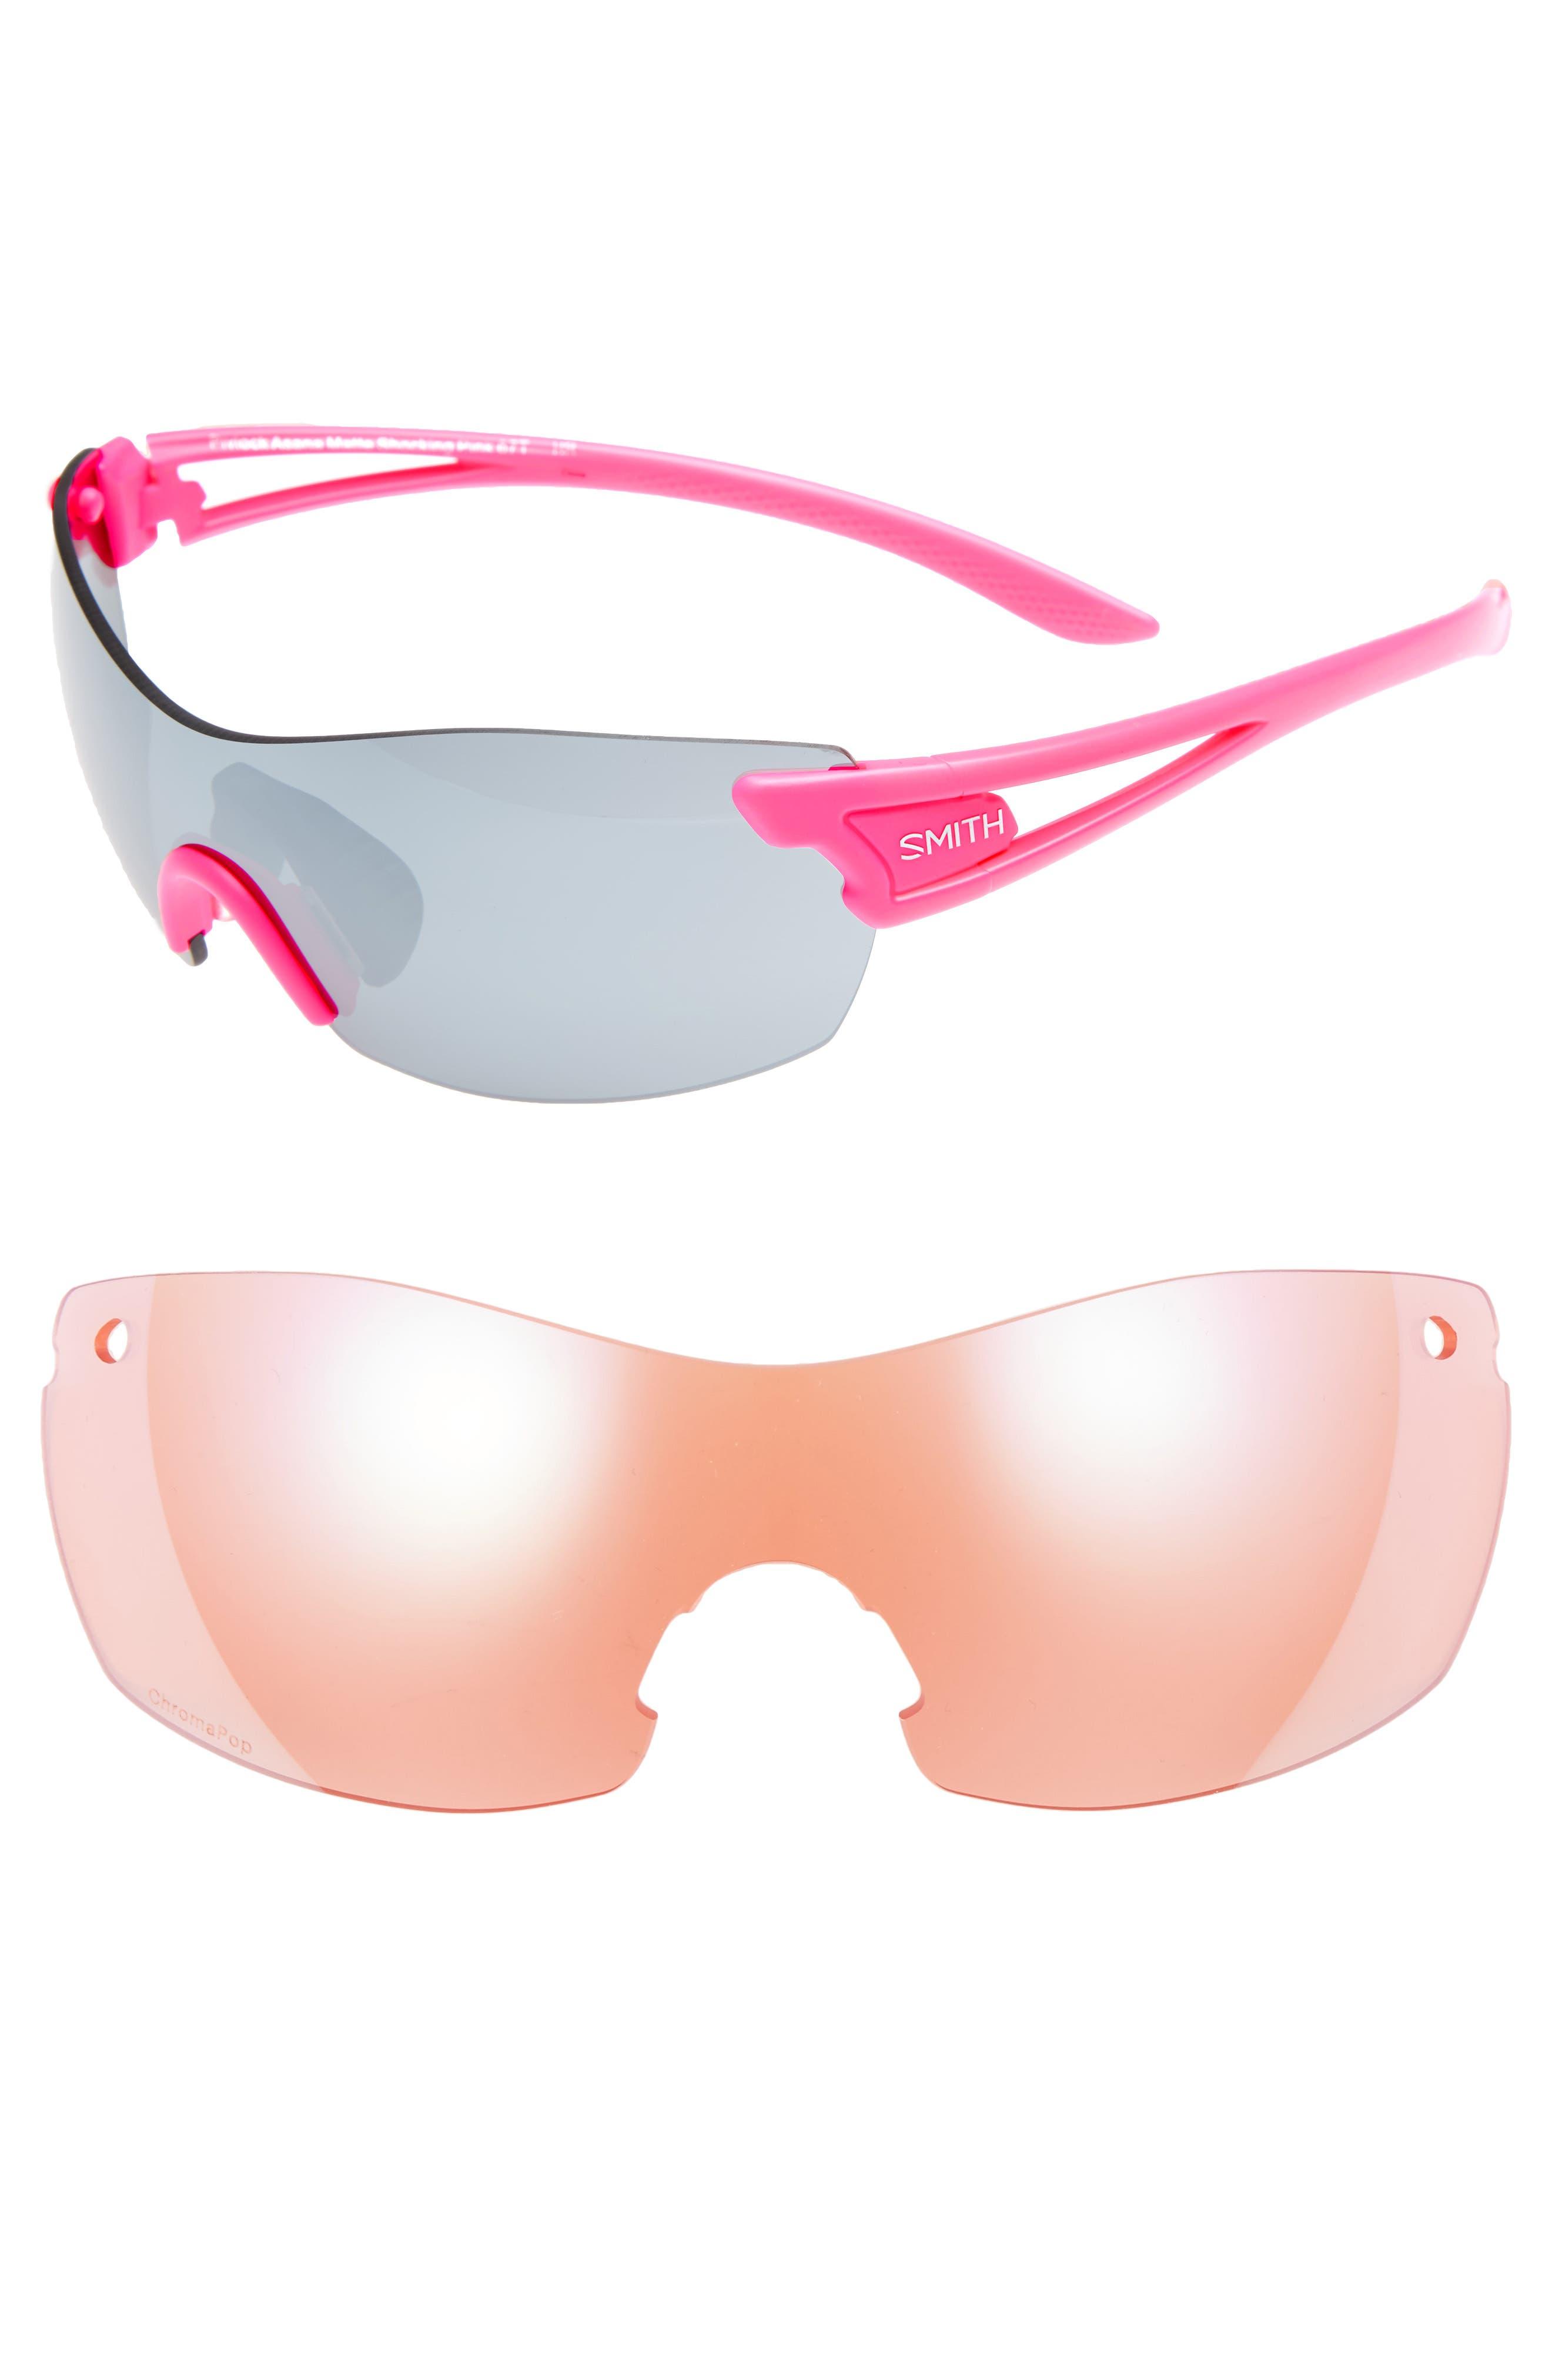 Alternate Image 1 Selected - Smith PivLock™ Asana 125mm ChromaPop Polarized Sunglasses